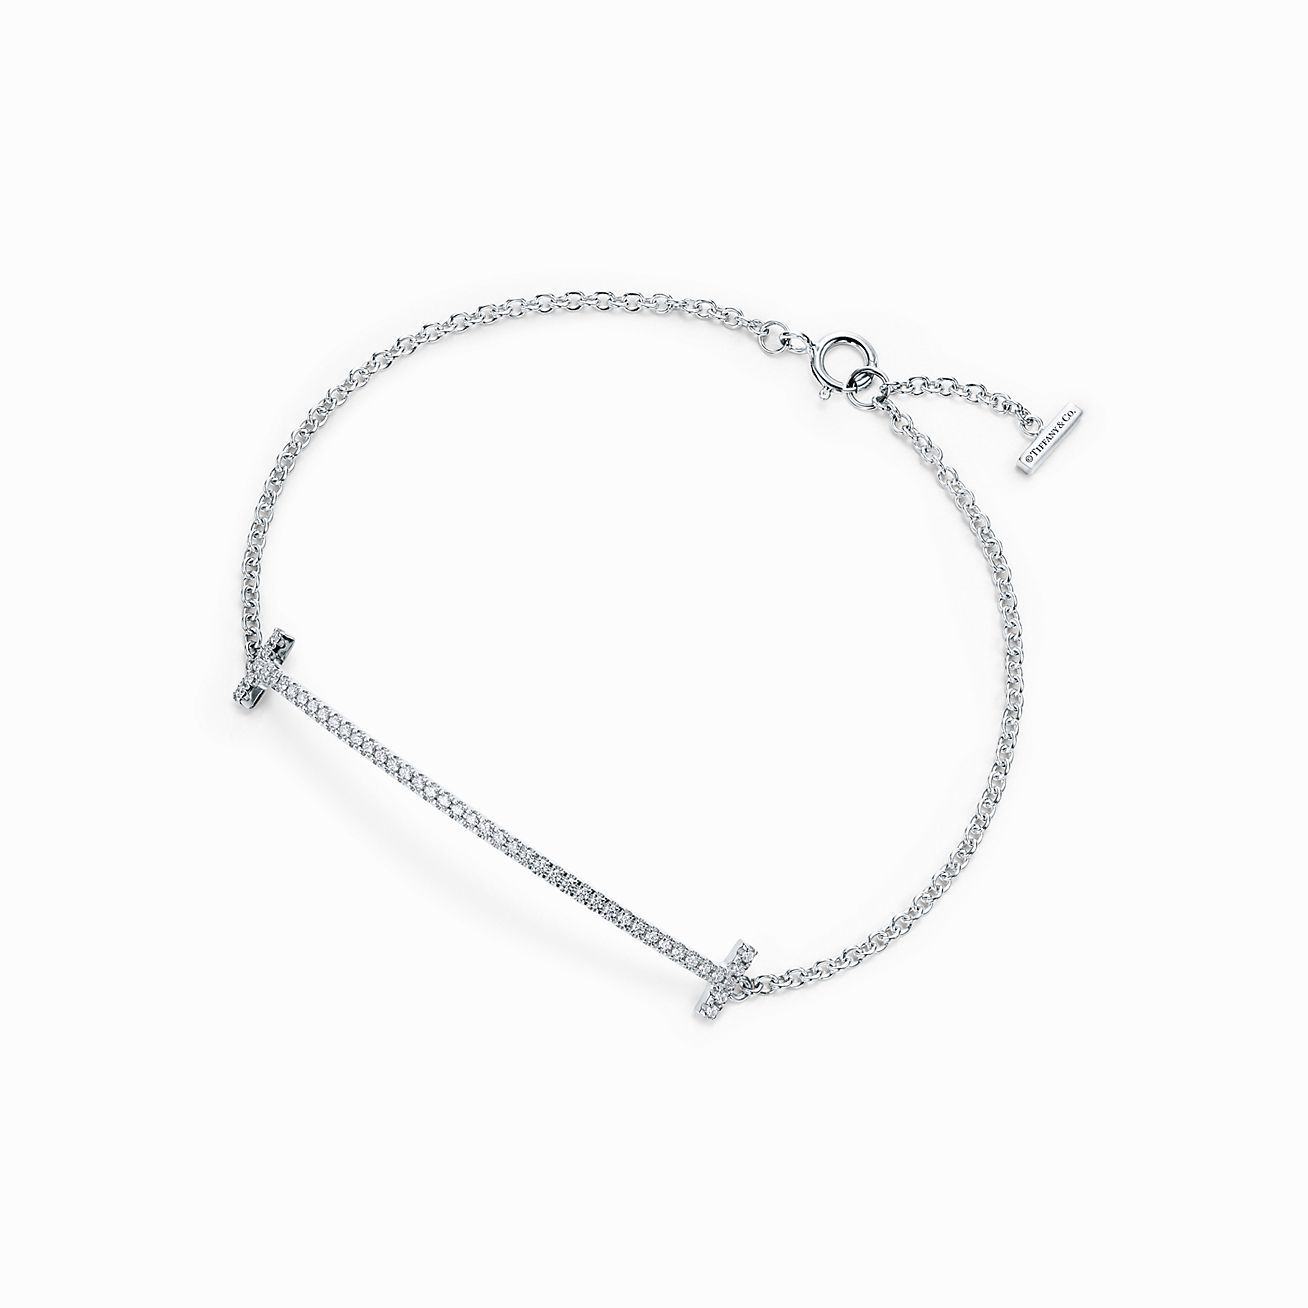 Tiffany Sourire T Boucles D'oreilles En Or Blanc 18 Carats Avec Diamants Tiffany & Co. N6pkoinNIB